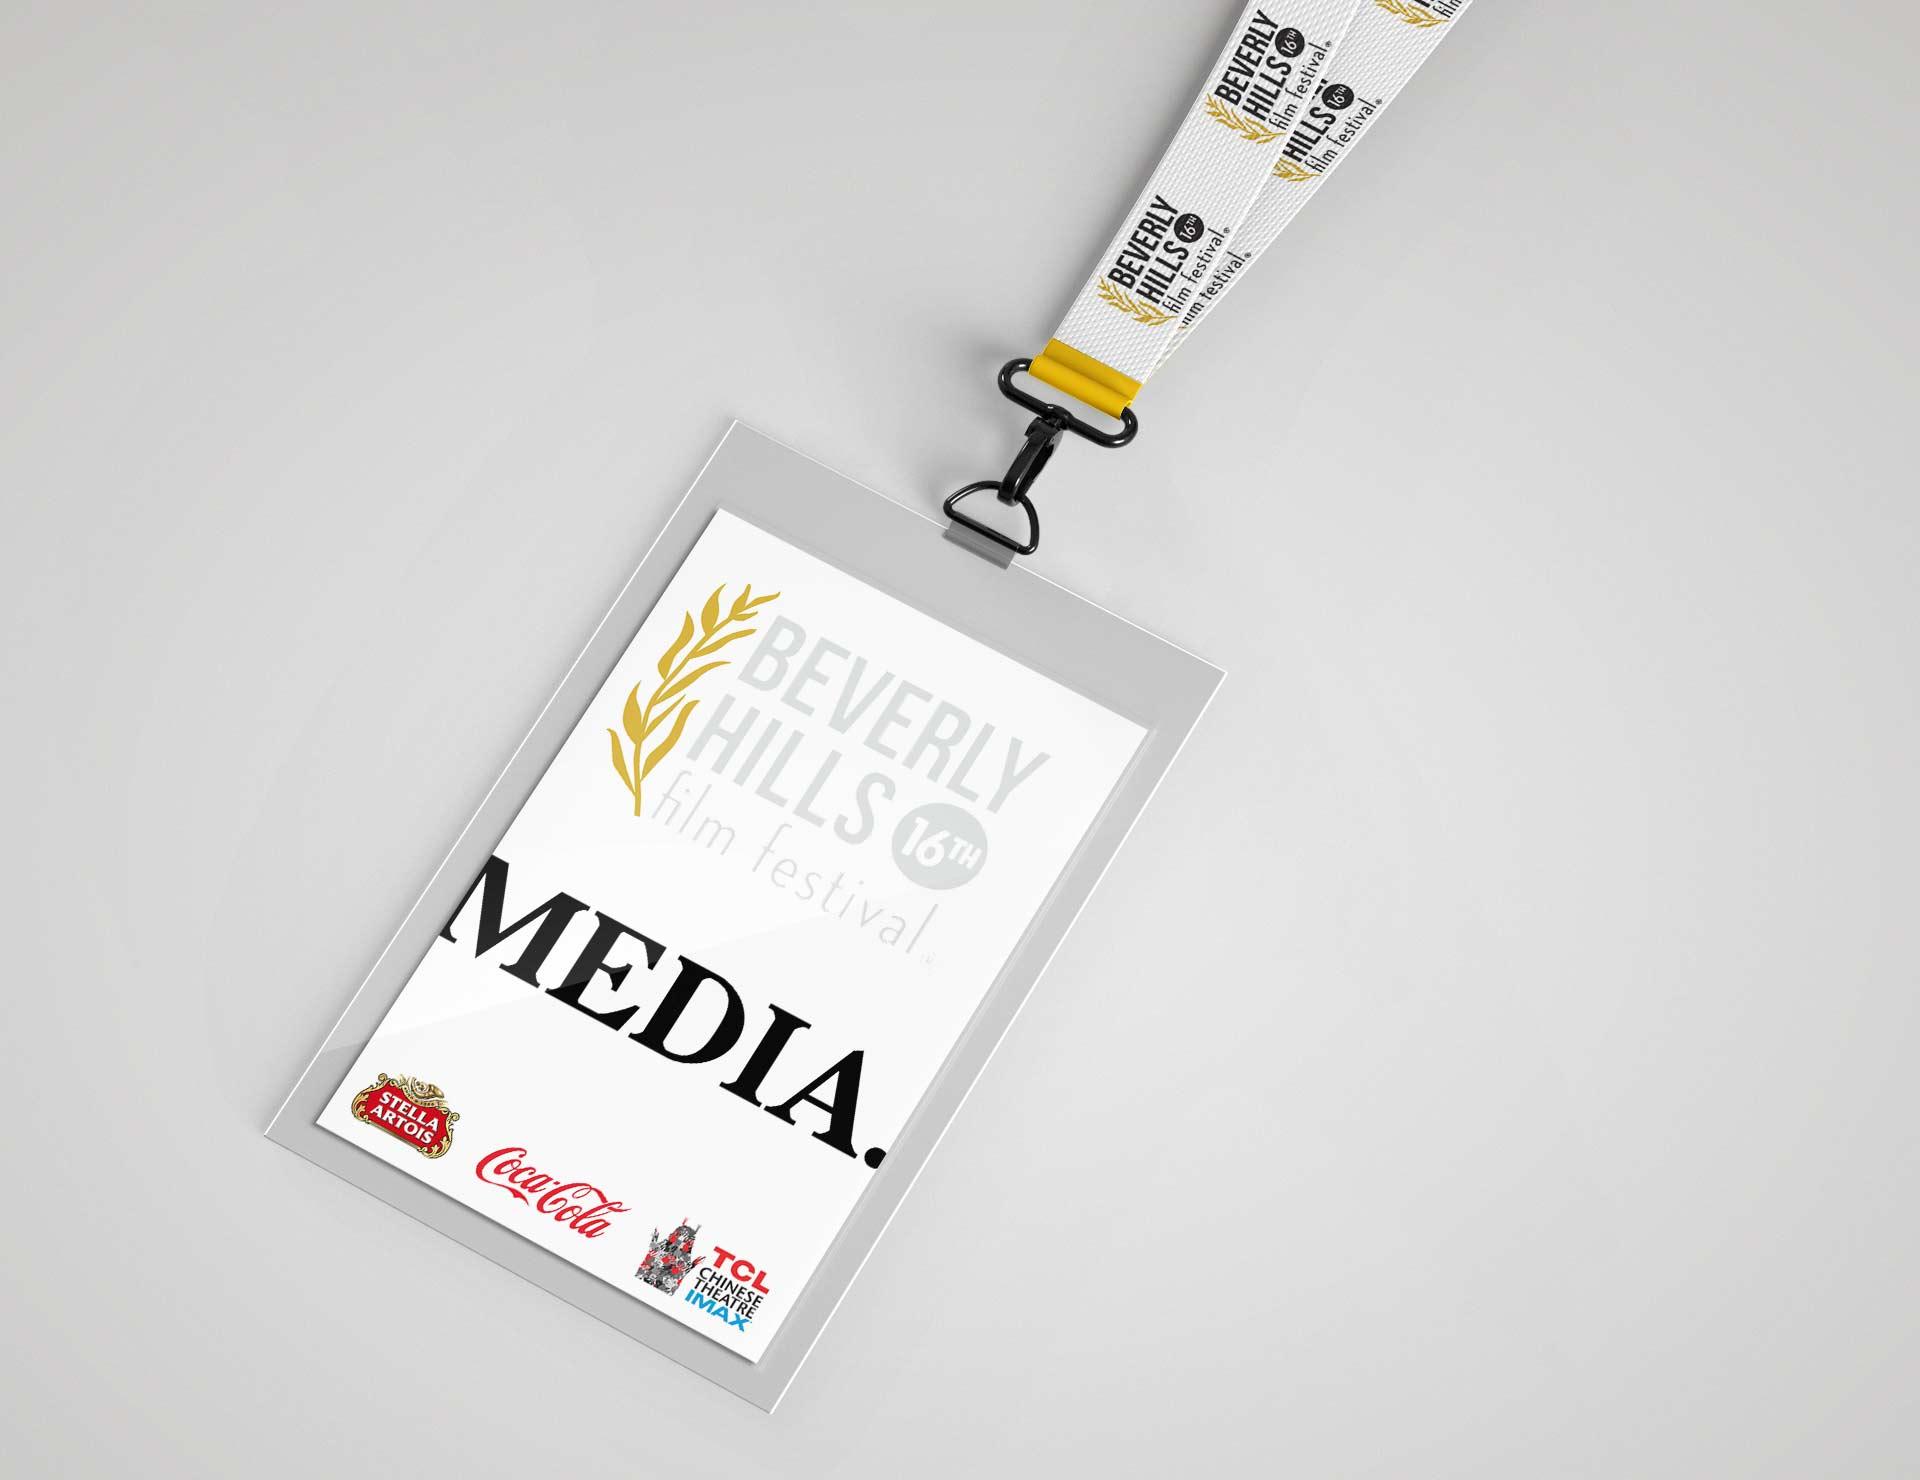 Medi event design tag